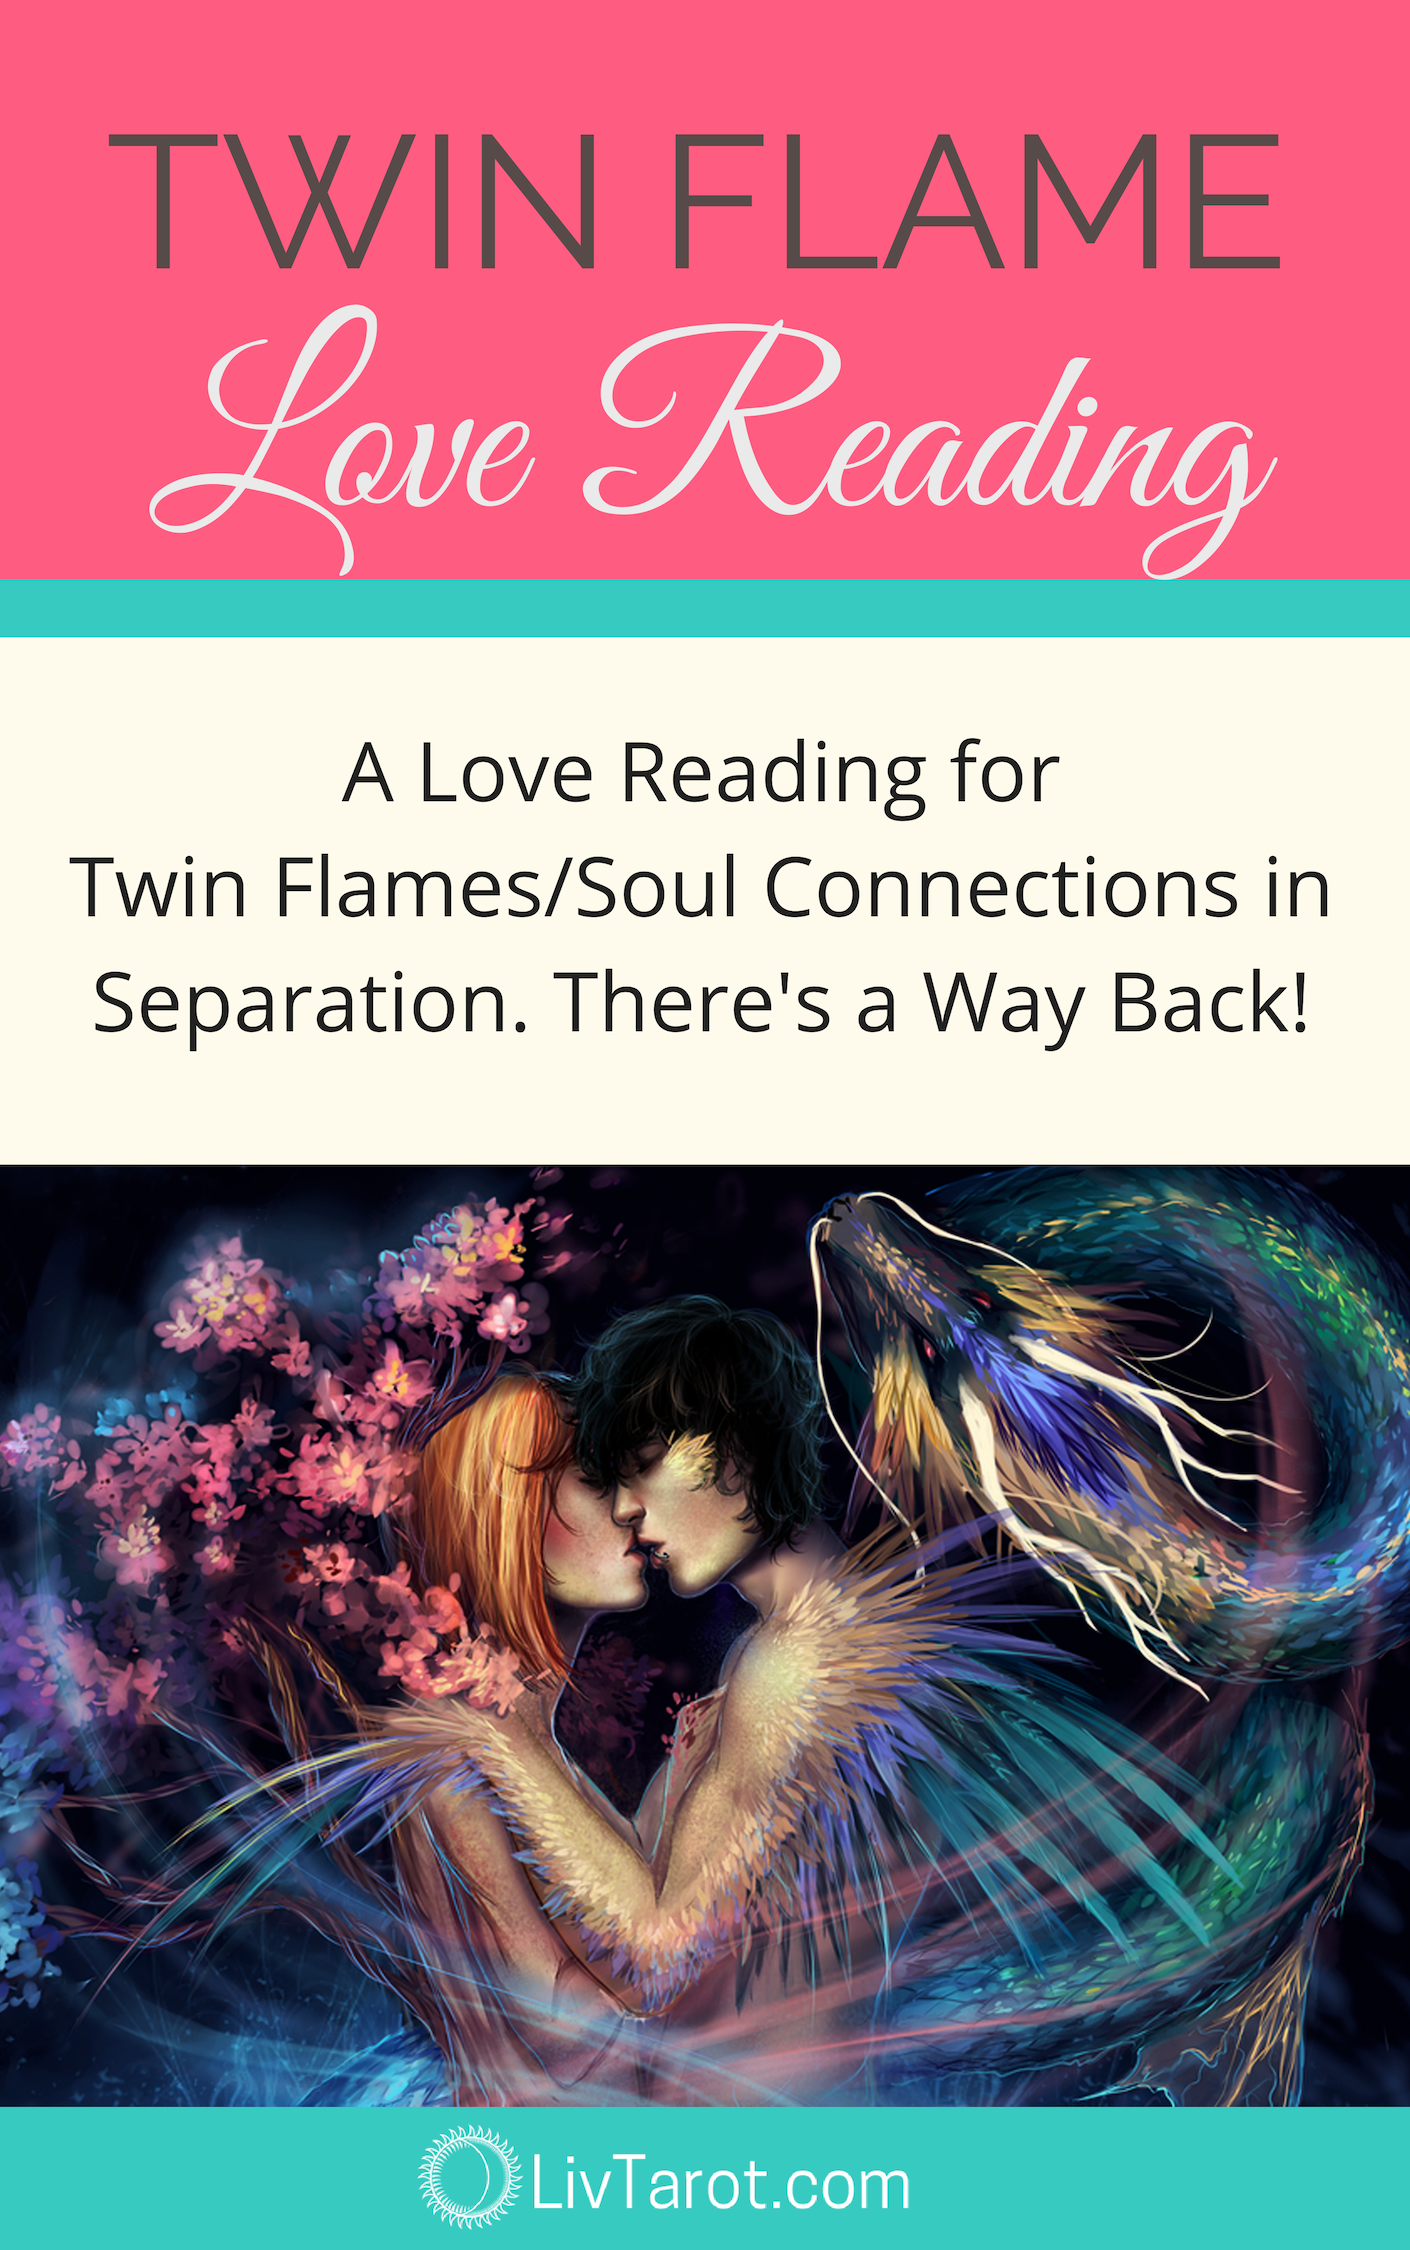 Blog | Twin Flames | Tarot learning, Free tarot reading